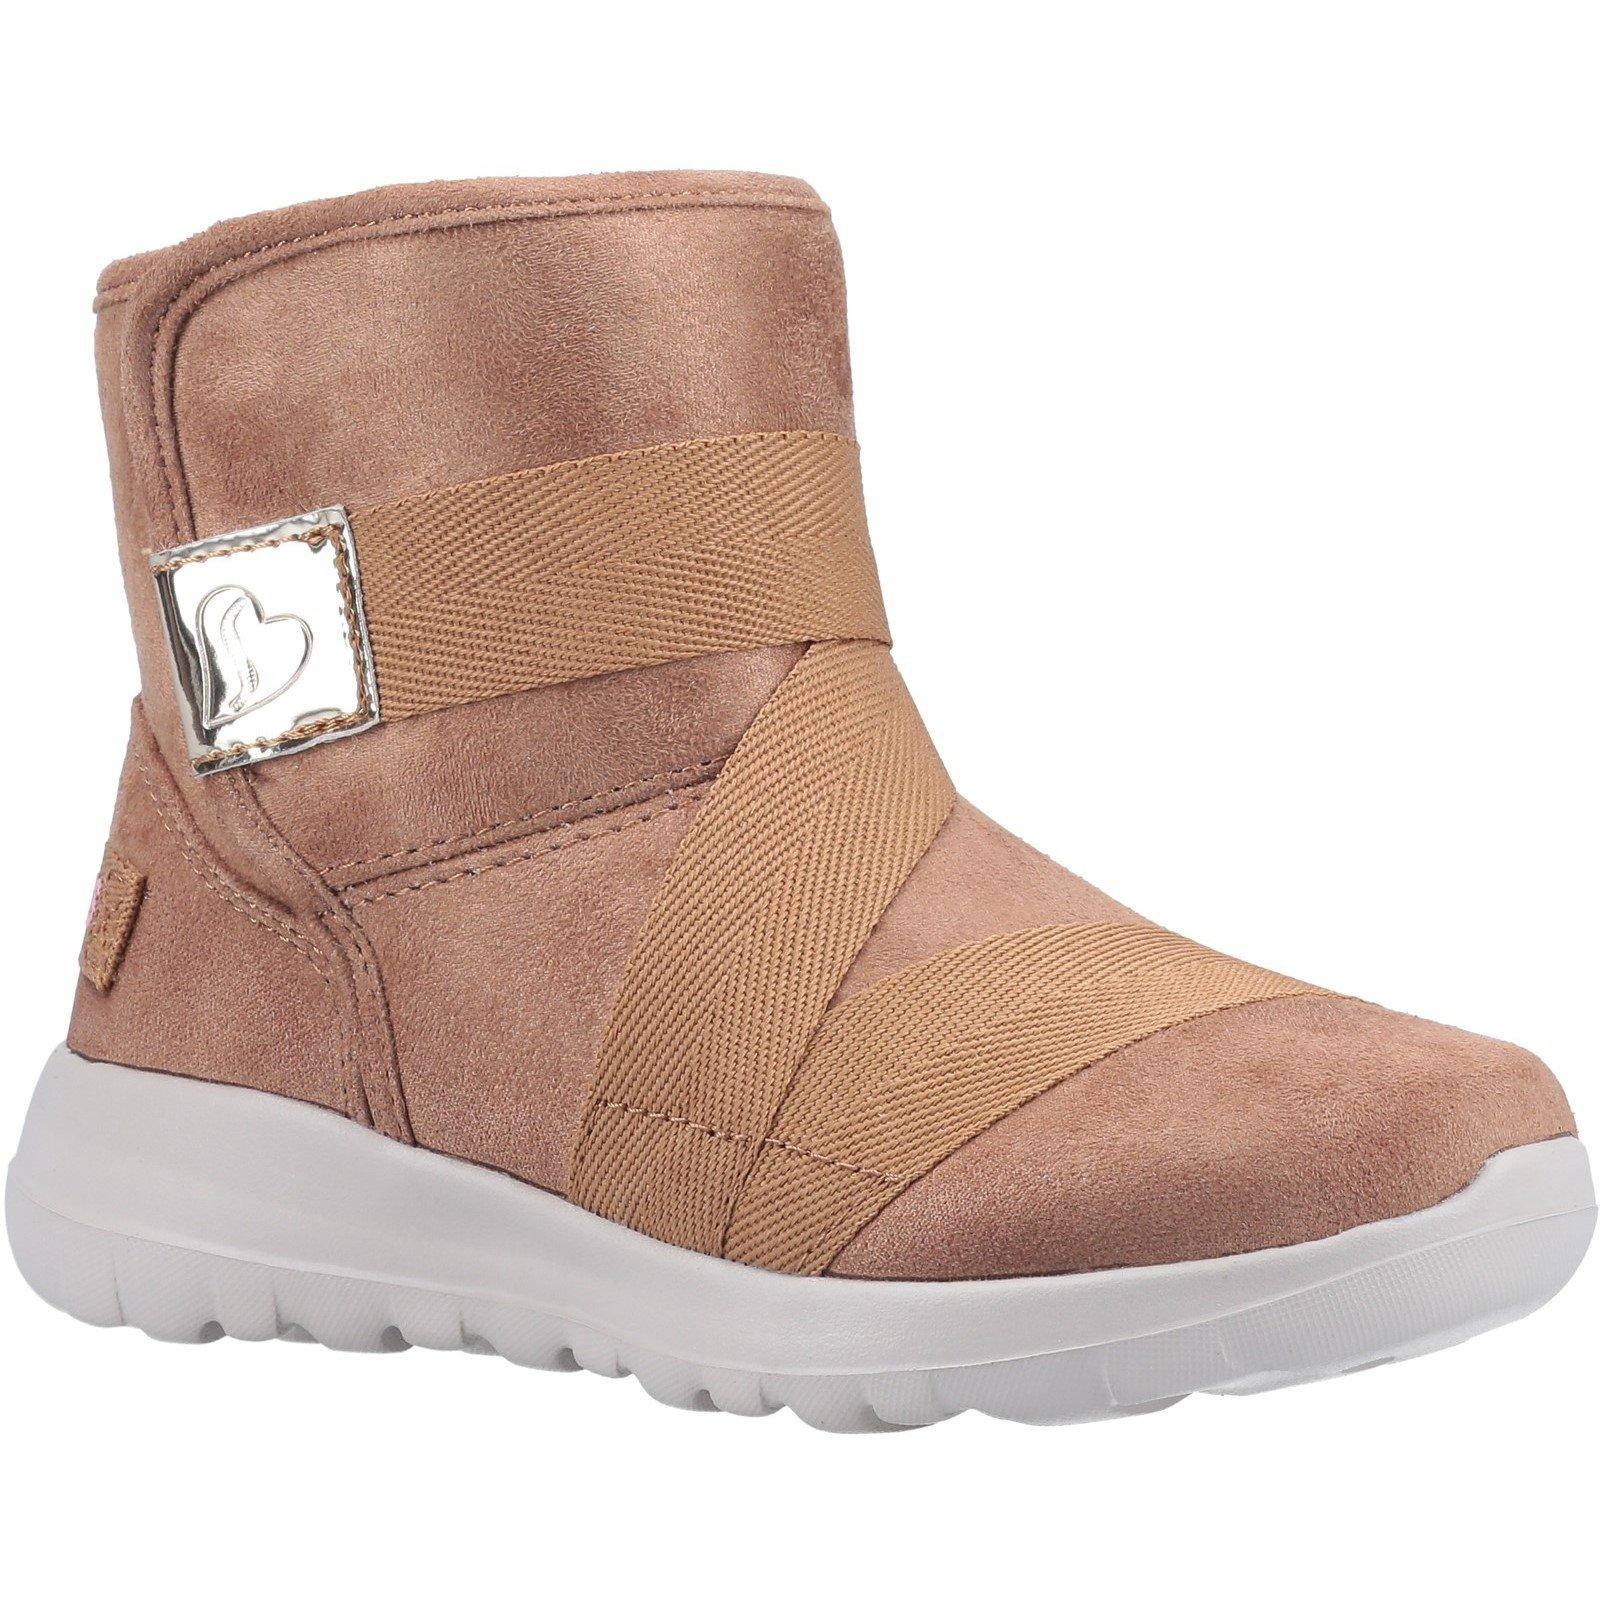 Skechers Unisex Go Walk Joy Strong Willed Ankle Boot Chestnut 31167 - Chestnut 3